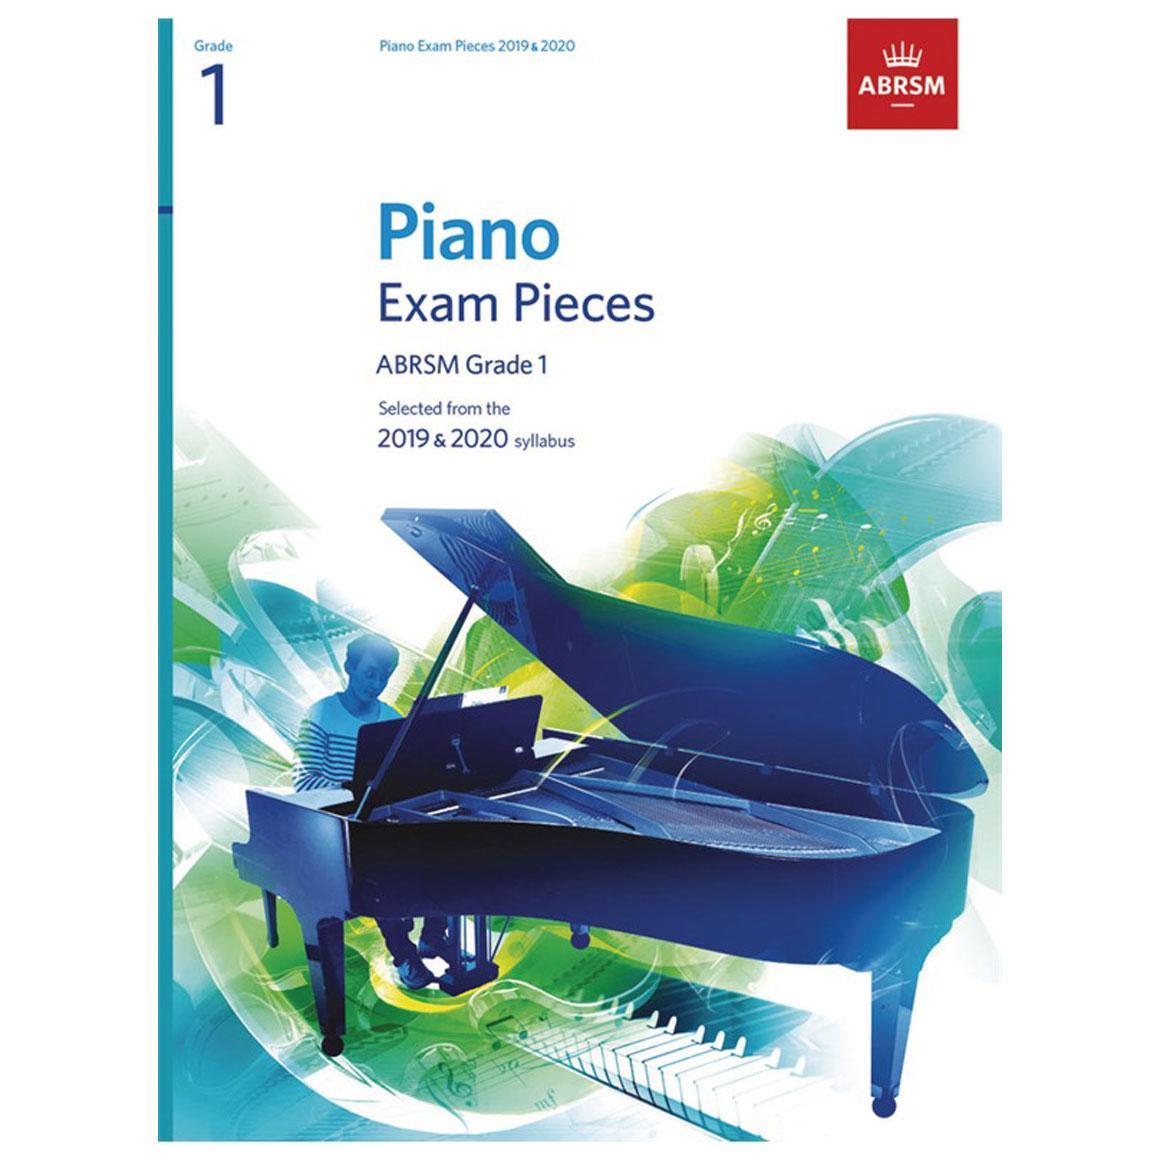 ABRSM Piano Exam Pieces 2019 2020 - Grade 1 (Book Only)